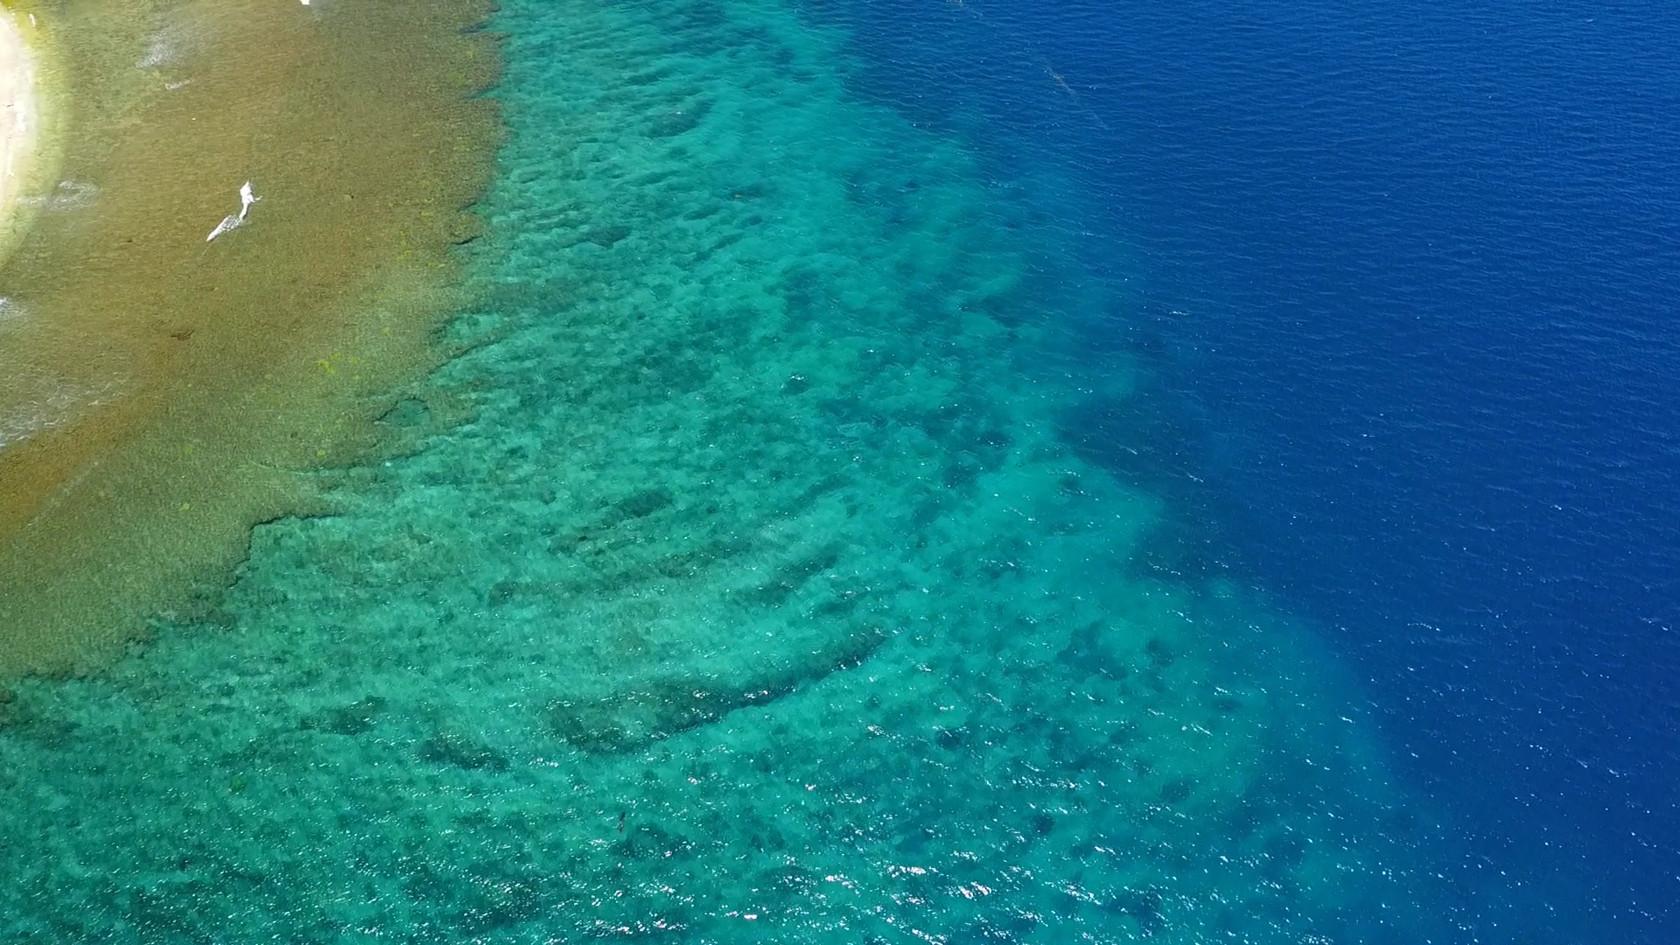 Marina Del Ray Gili Islands Bali Indones